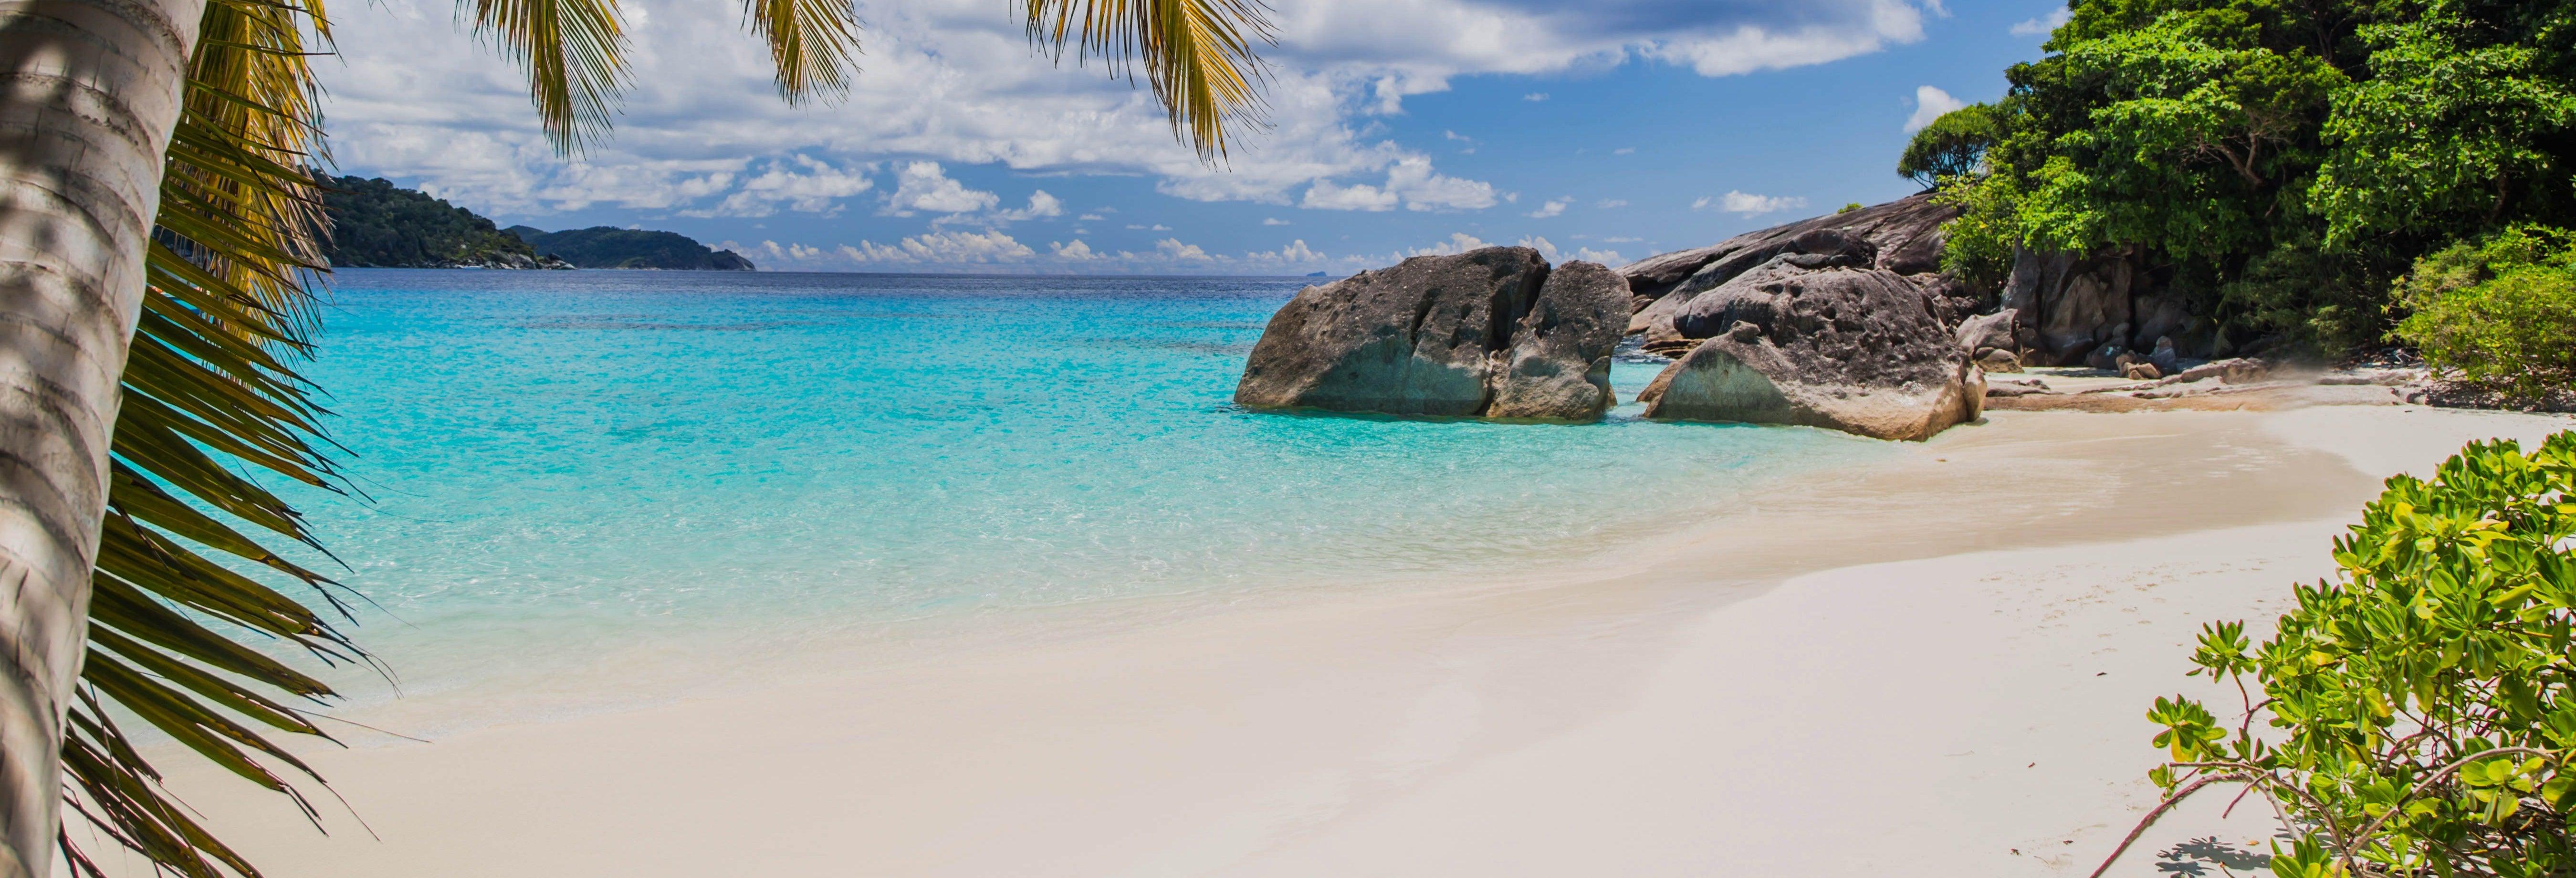 Excursão às ilhas Similan de lancha